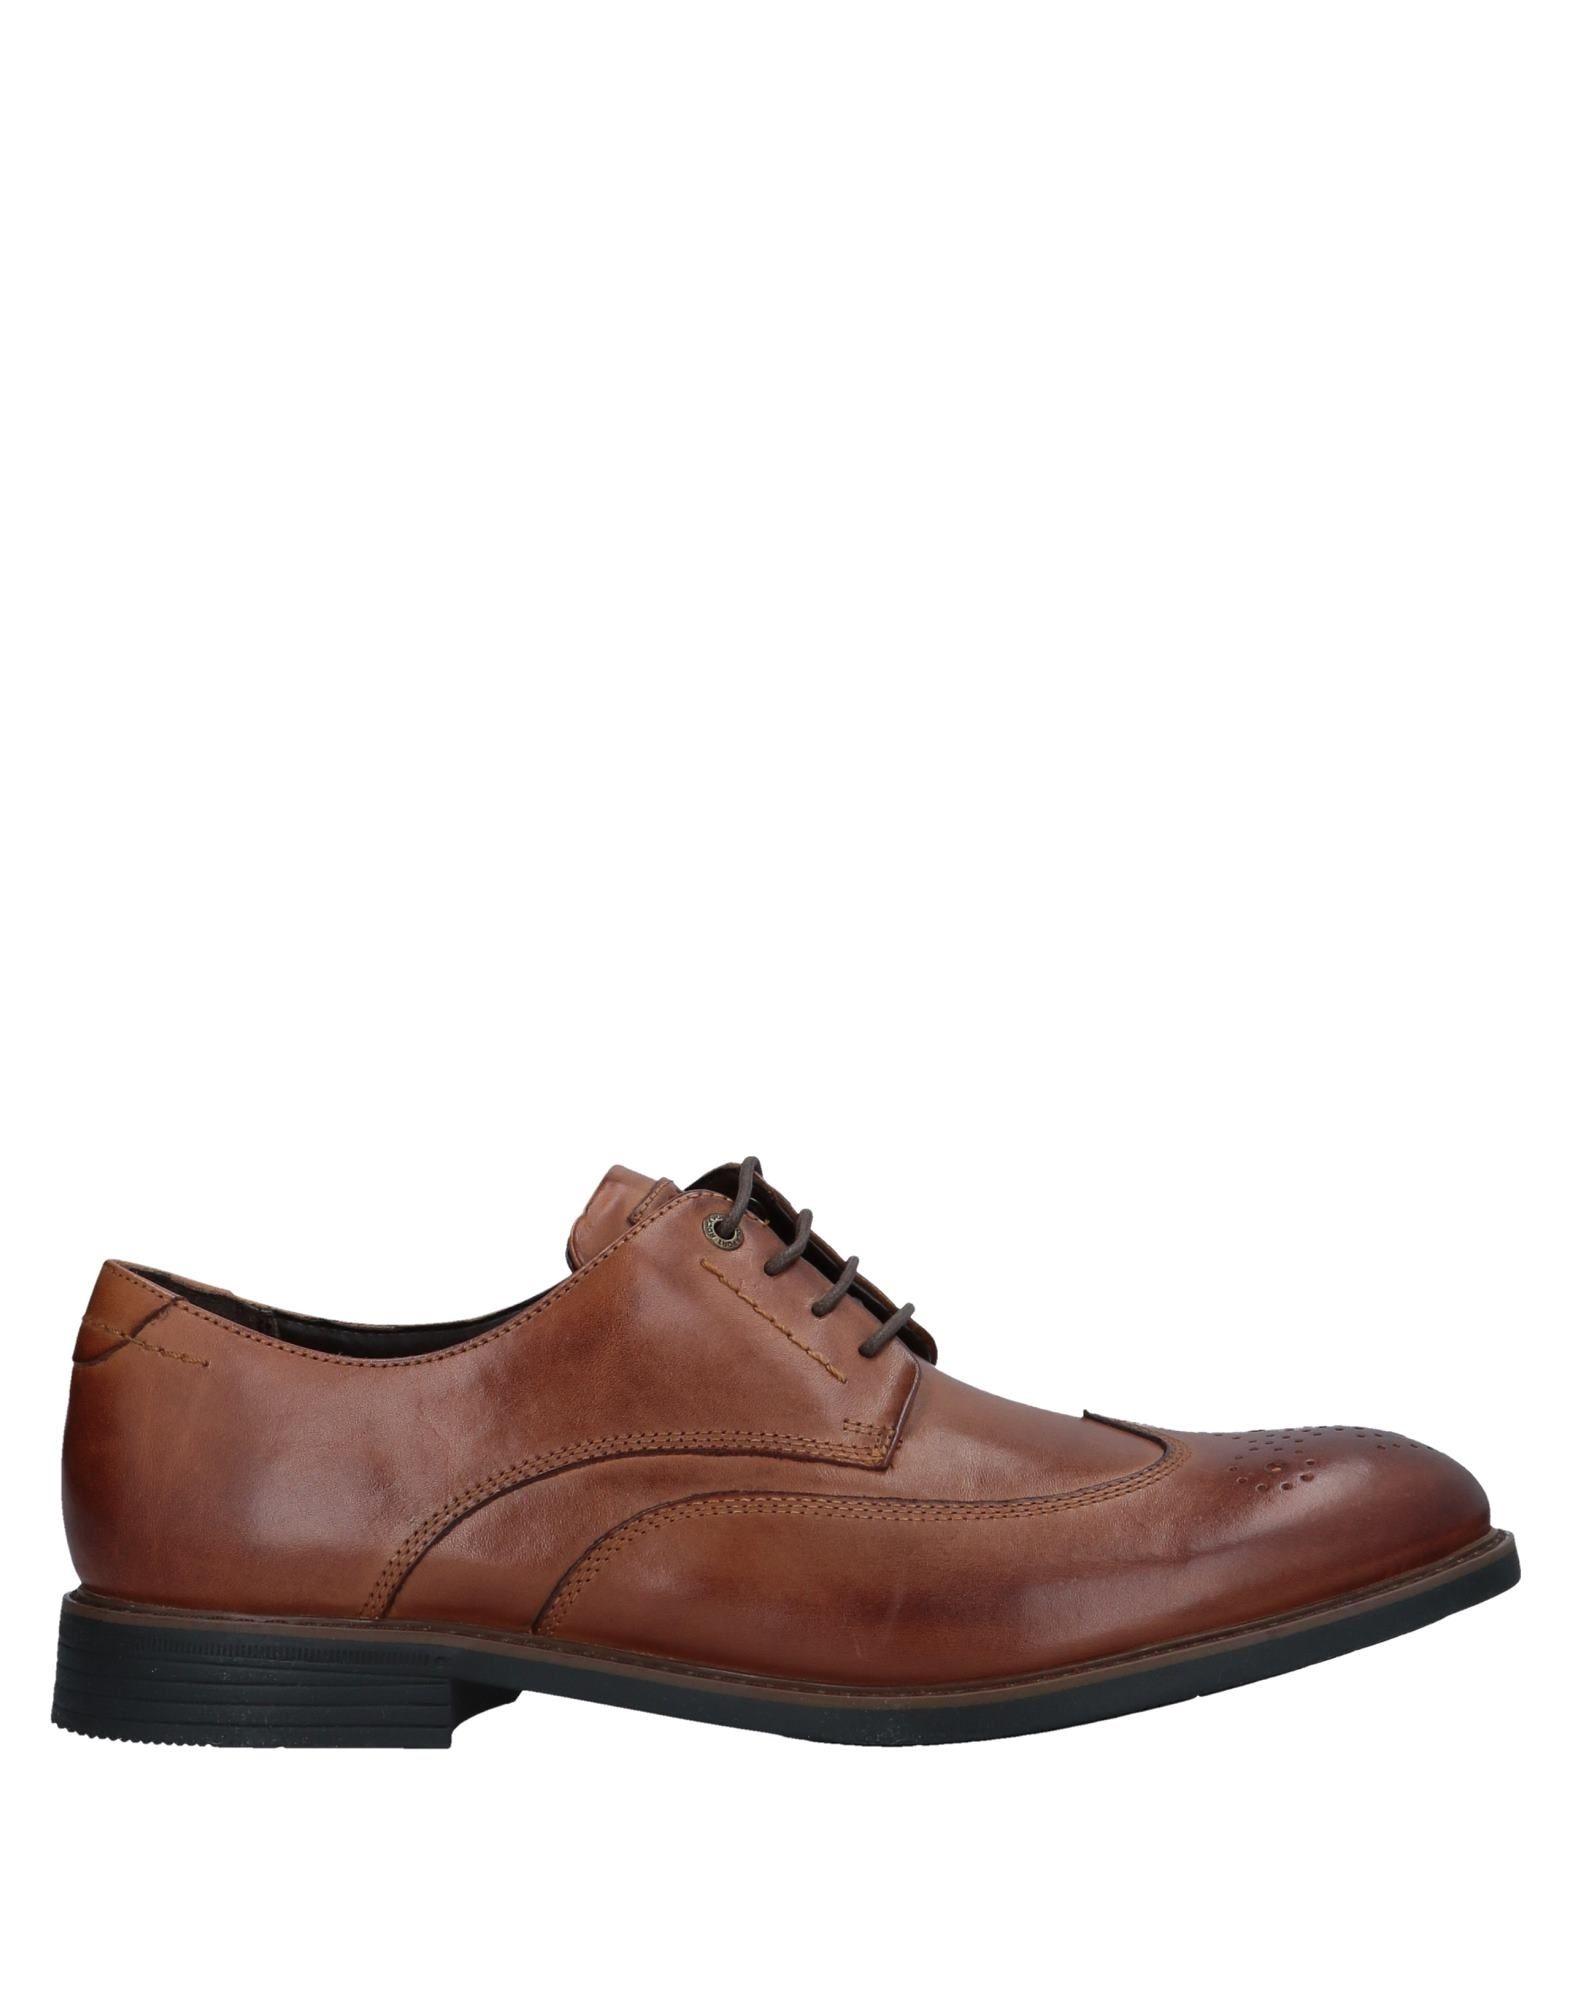 Rabatt echte Schuhe Rockport Schnürschuhe Herren  11509095FH